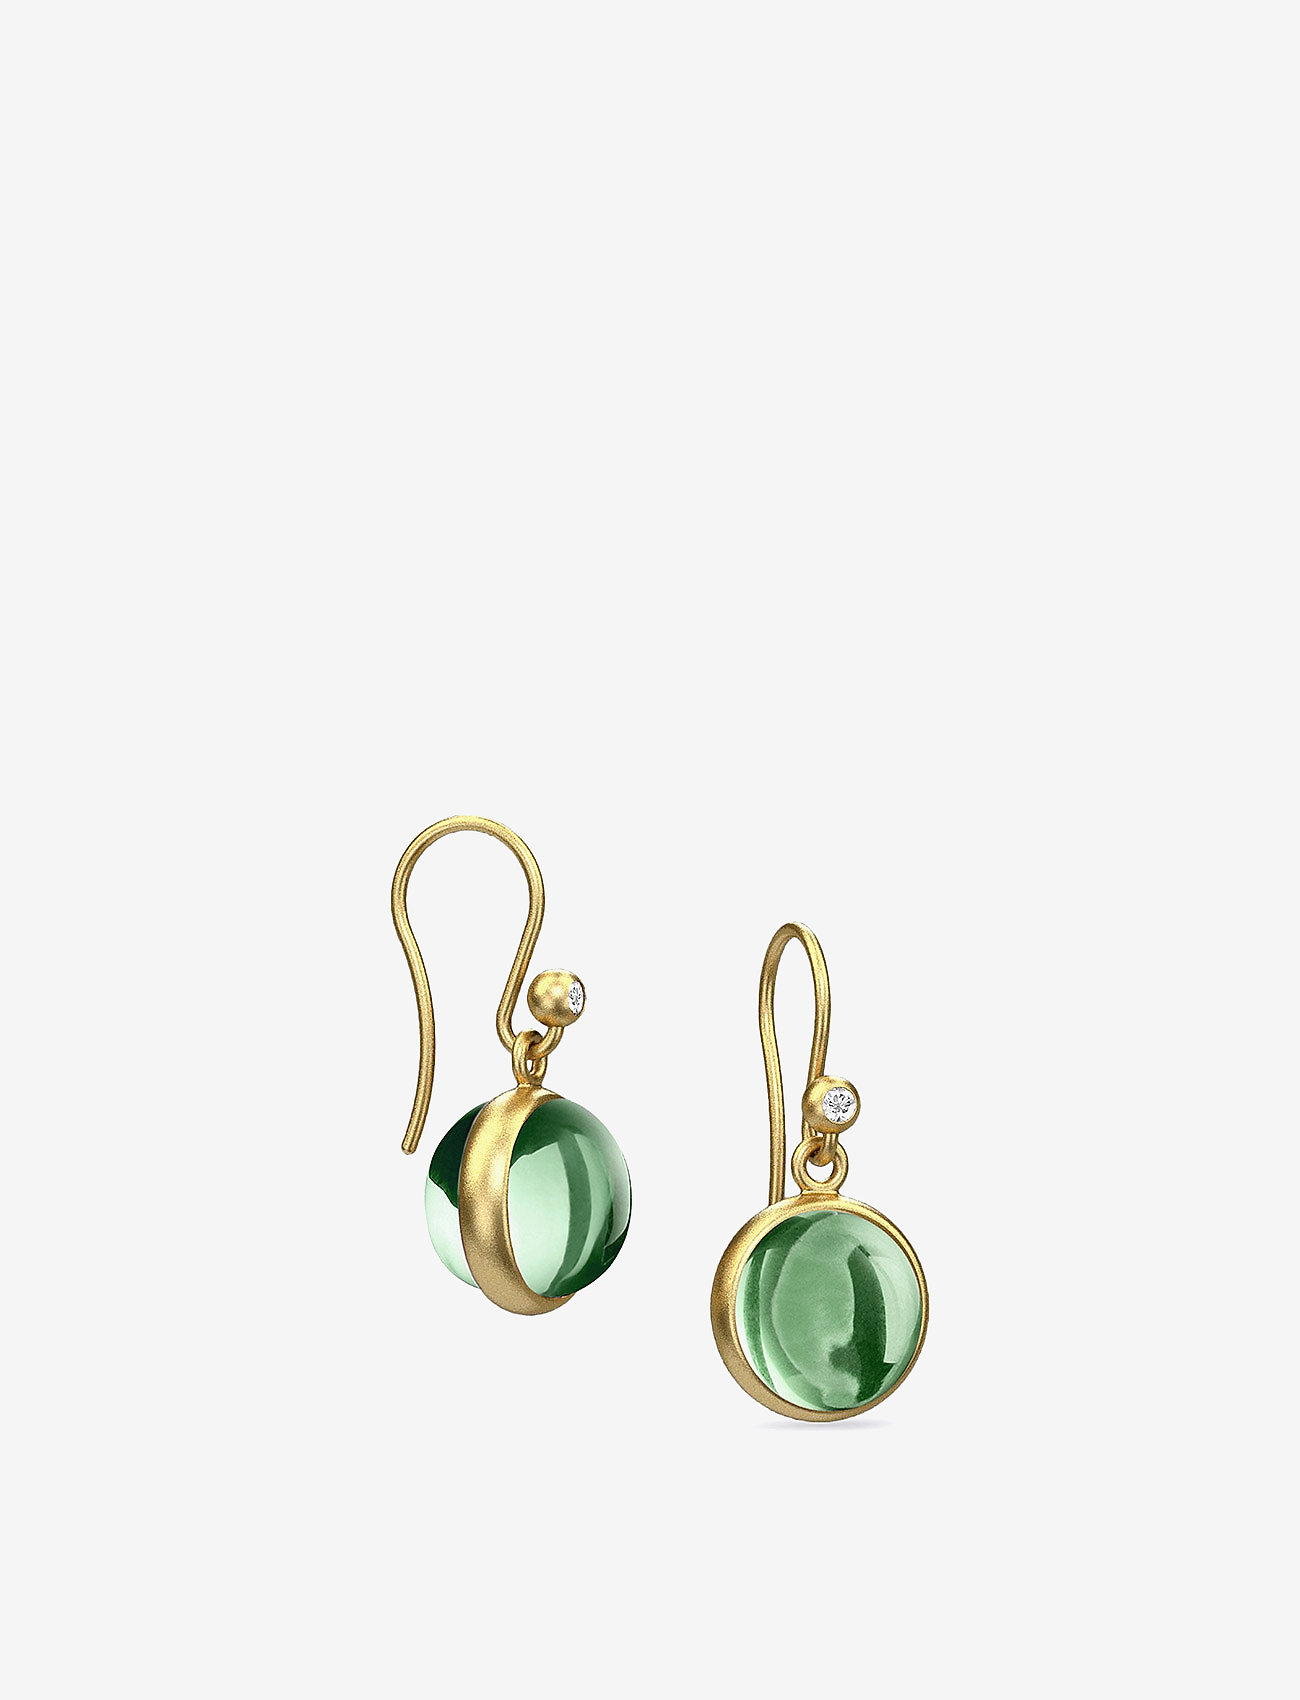 Julie Sandlau - Prime earring - Gold - auskari ar kulonu - green - 1